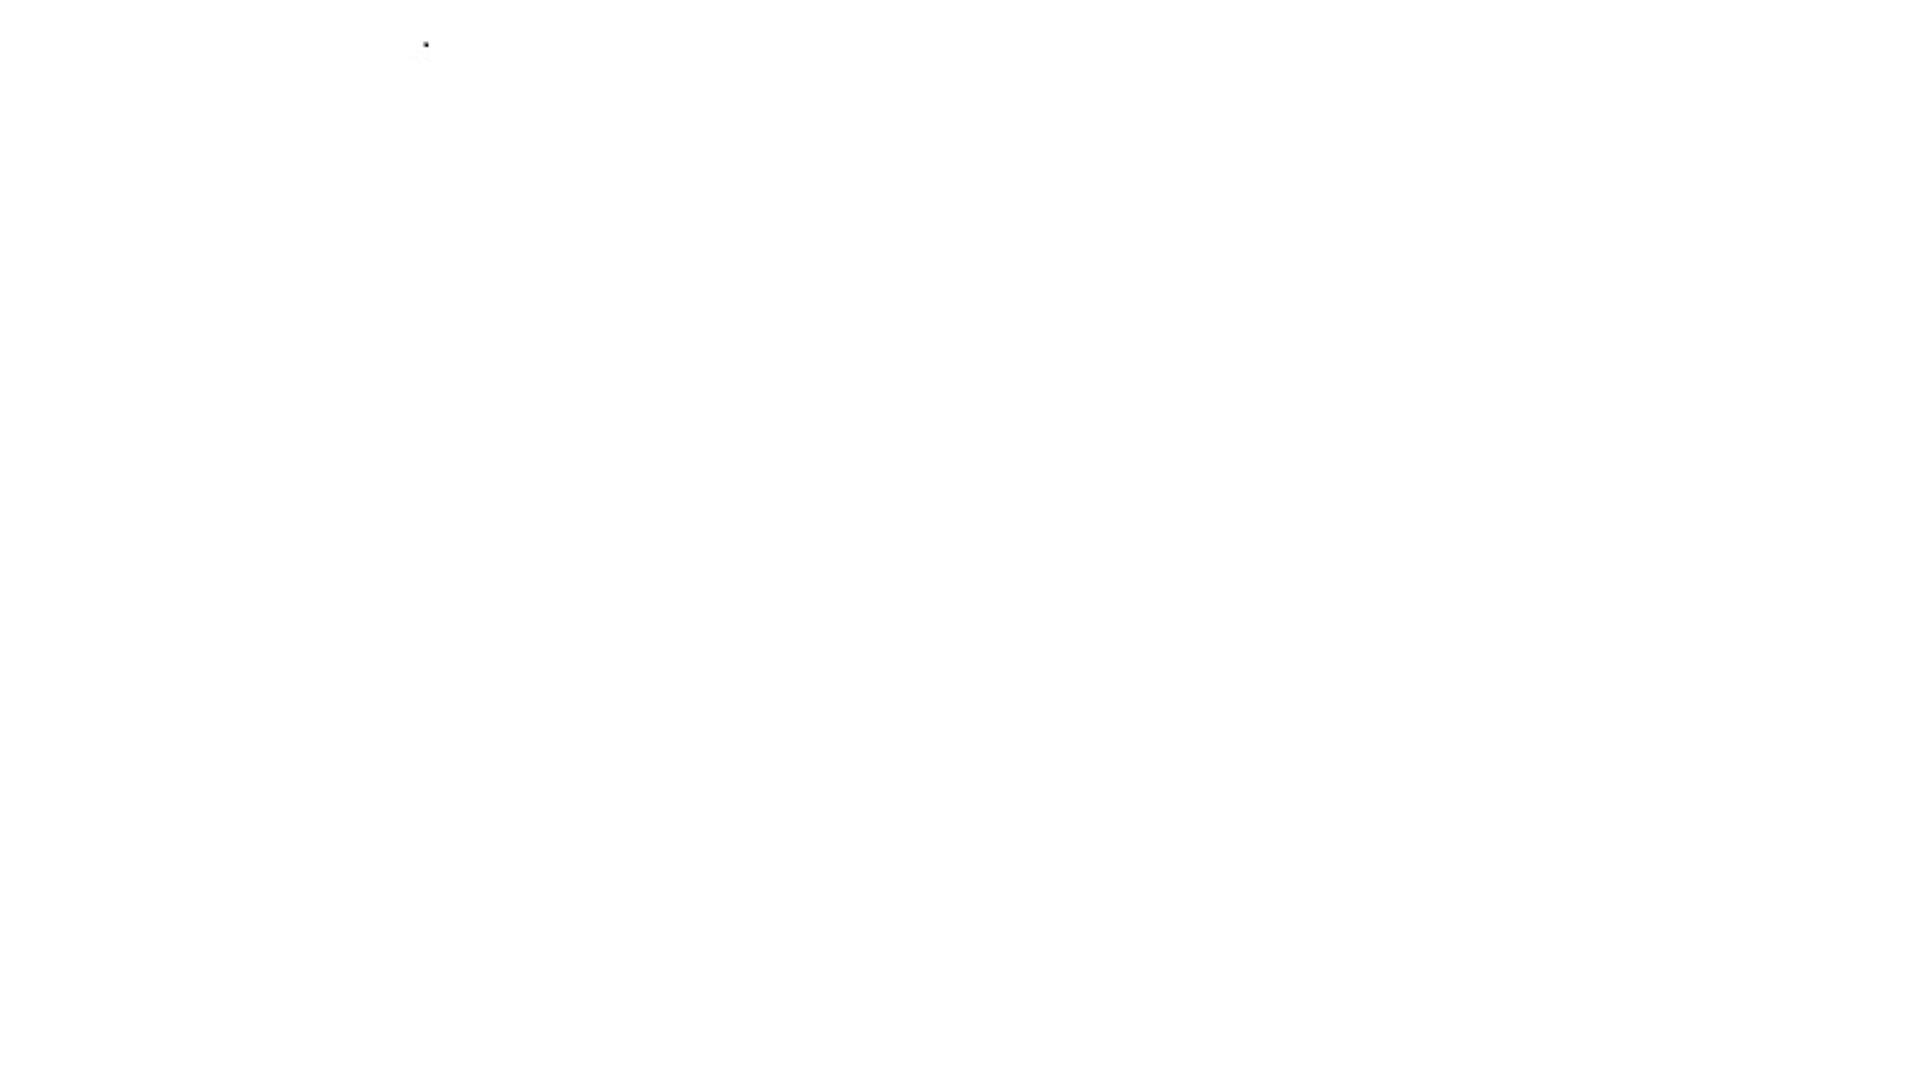 4CARS LED ŽIAROVKA 1LED 12V T10 MODRÁ